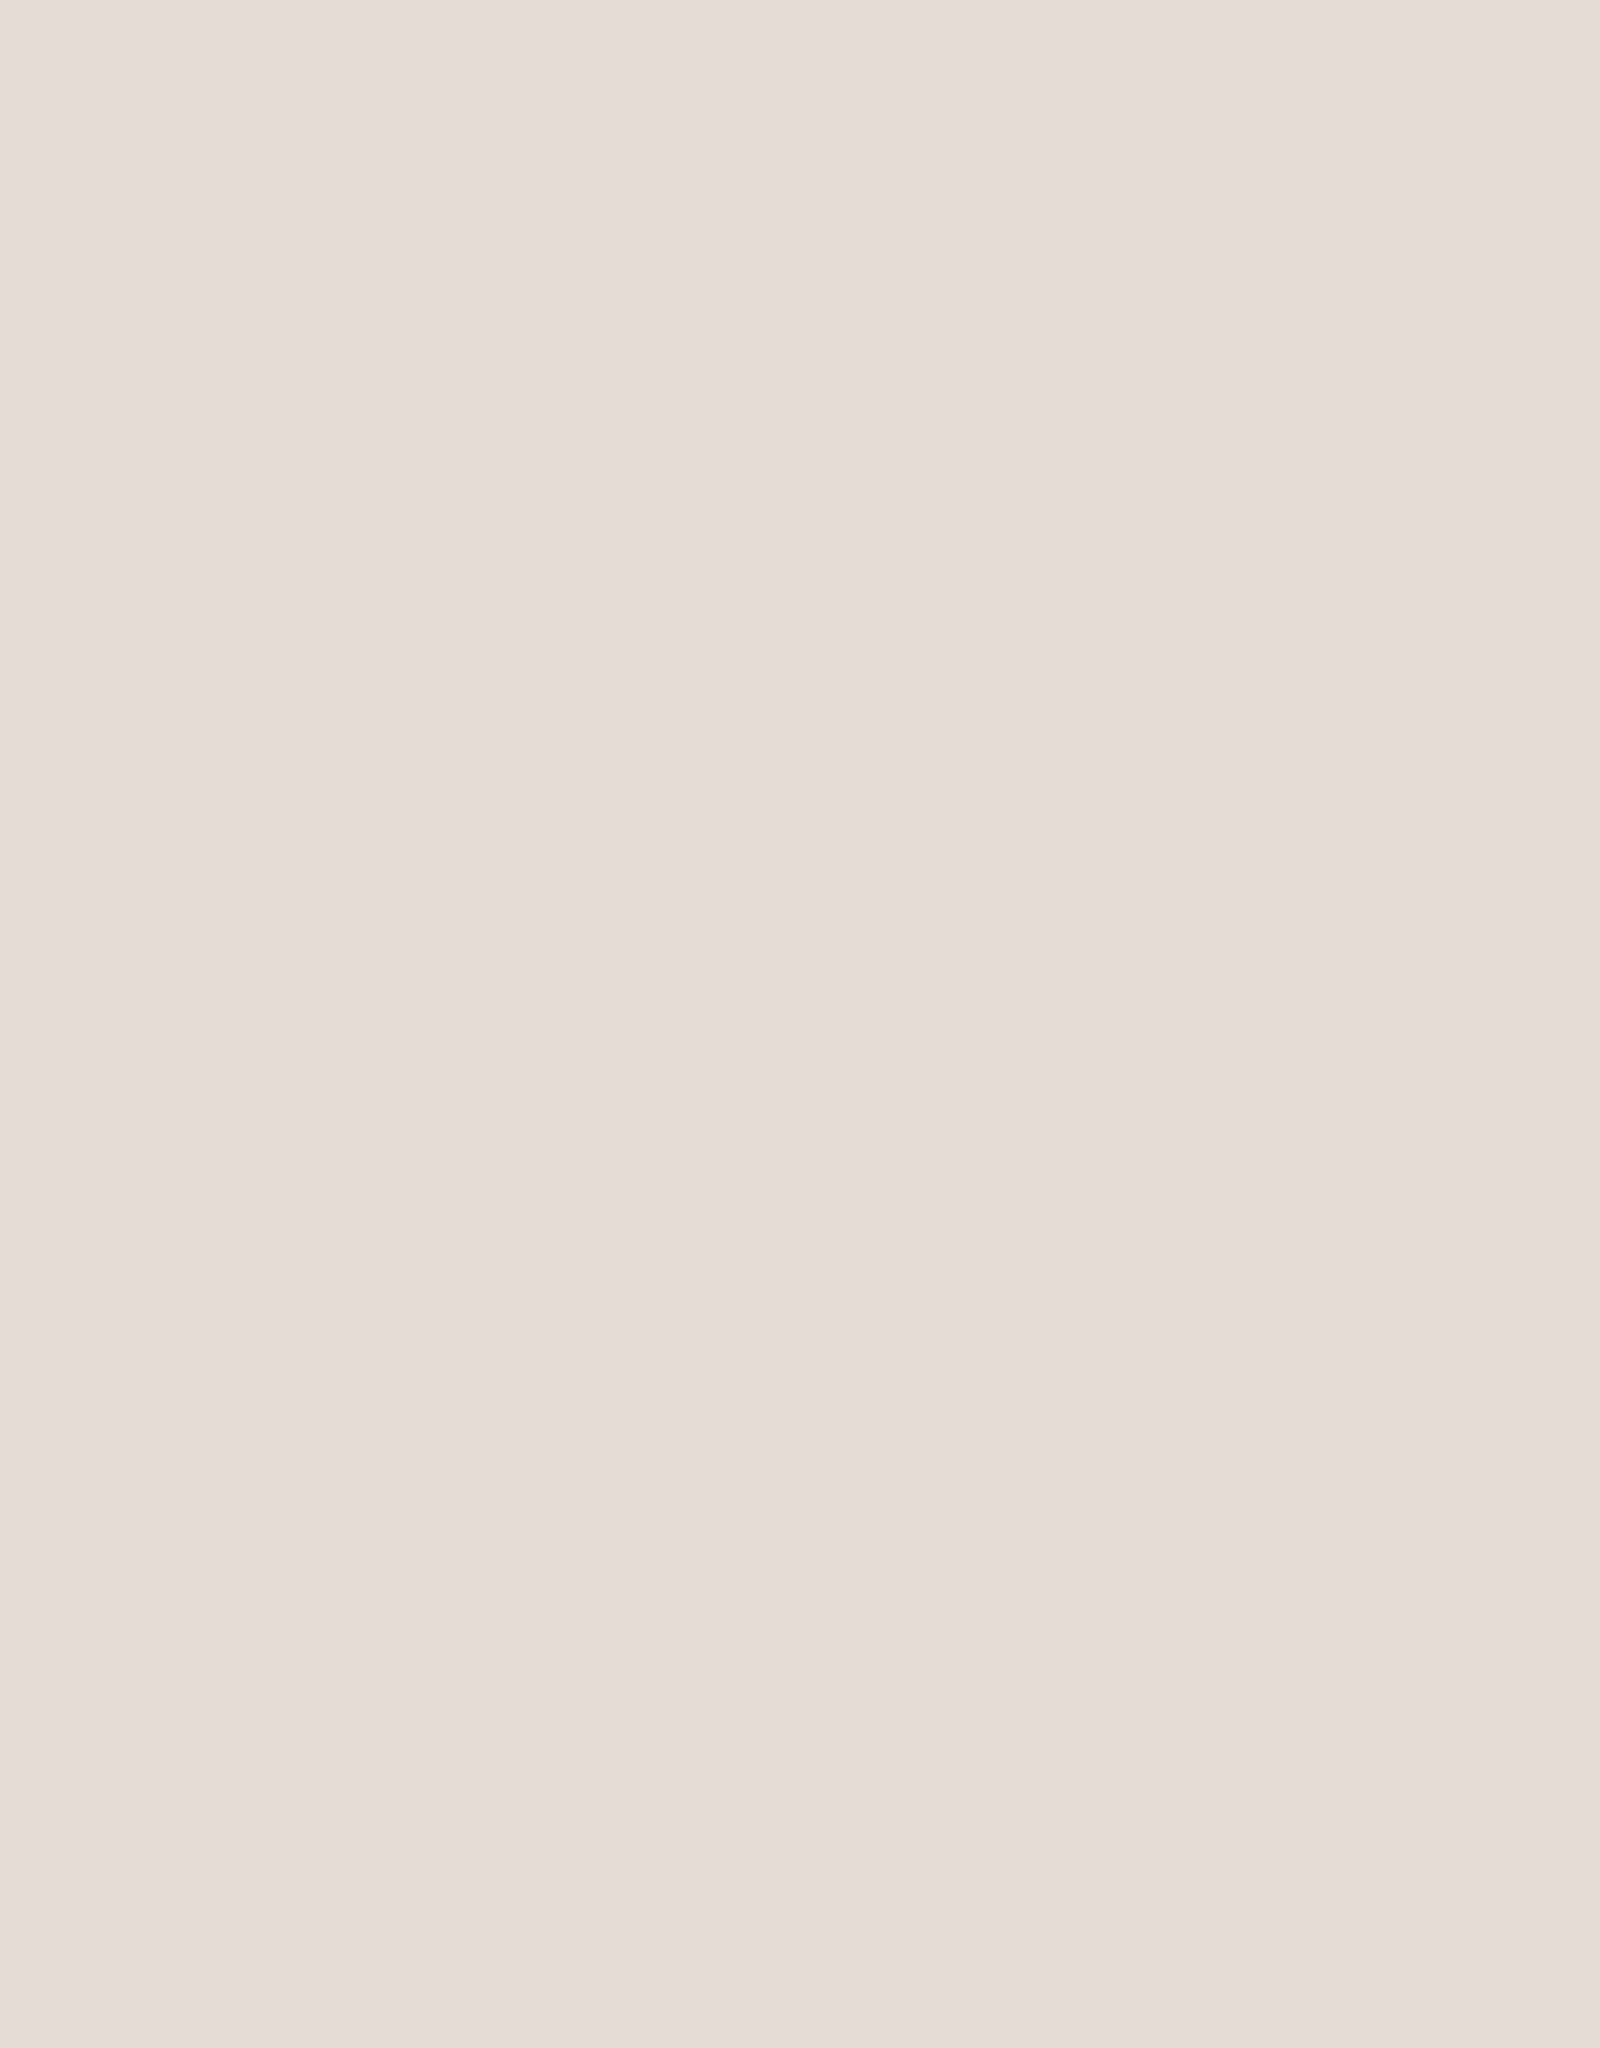 Kryolan FOUNDATION-TV PAINT STICK, WHITE (070)